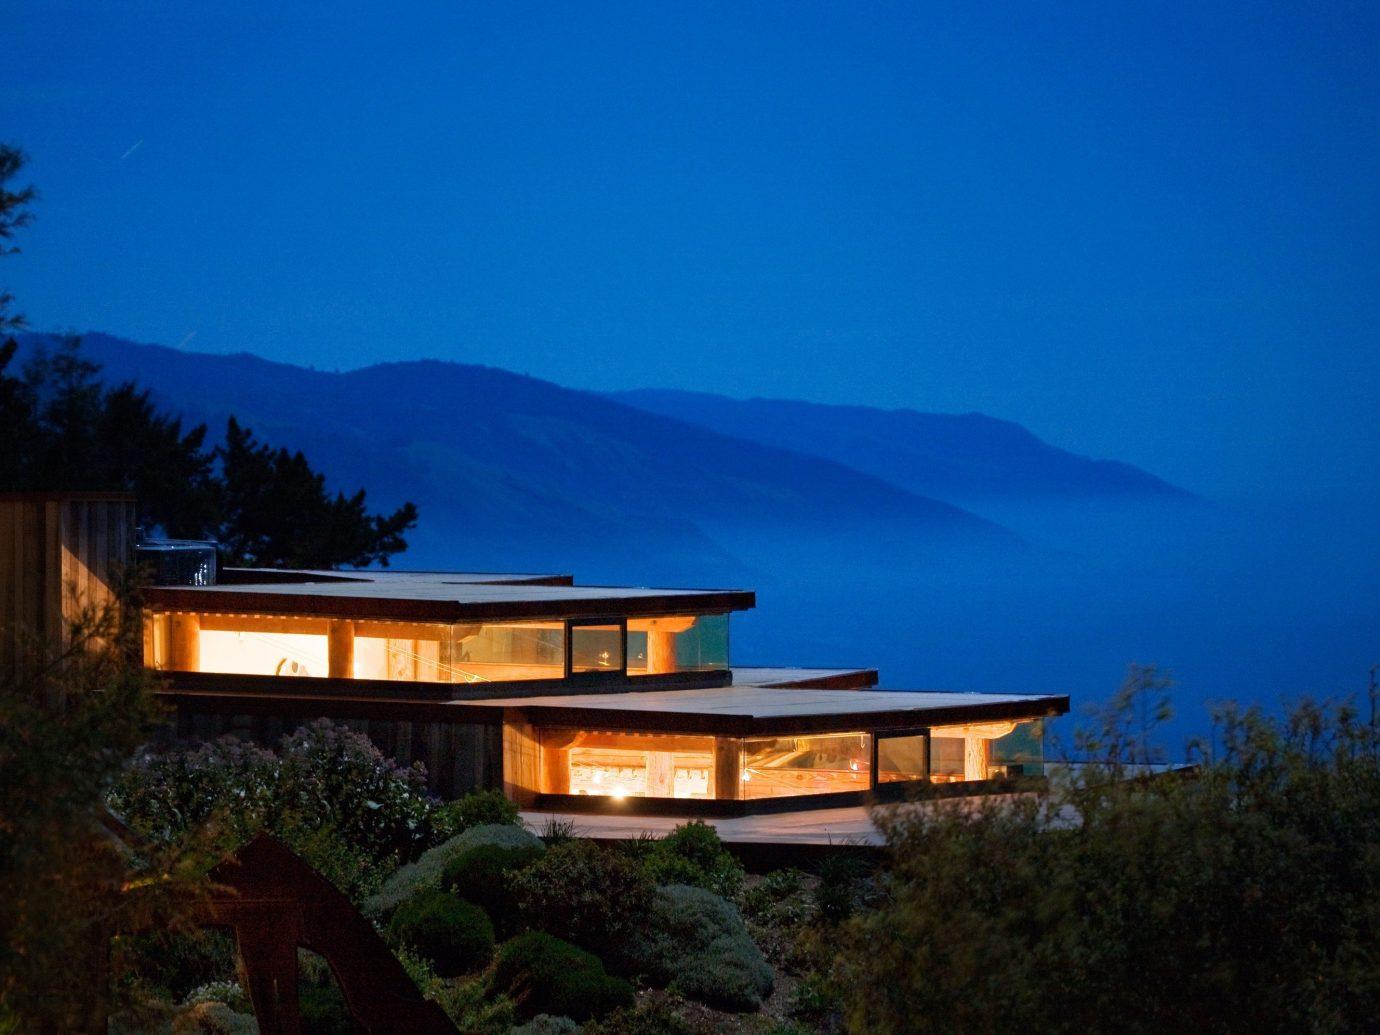 Hotels Trip Ideas tree outdoor sky house night mountain reflection evening morning estate dusk sign hillside